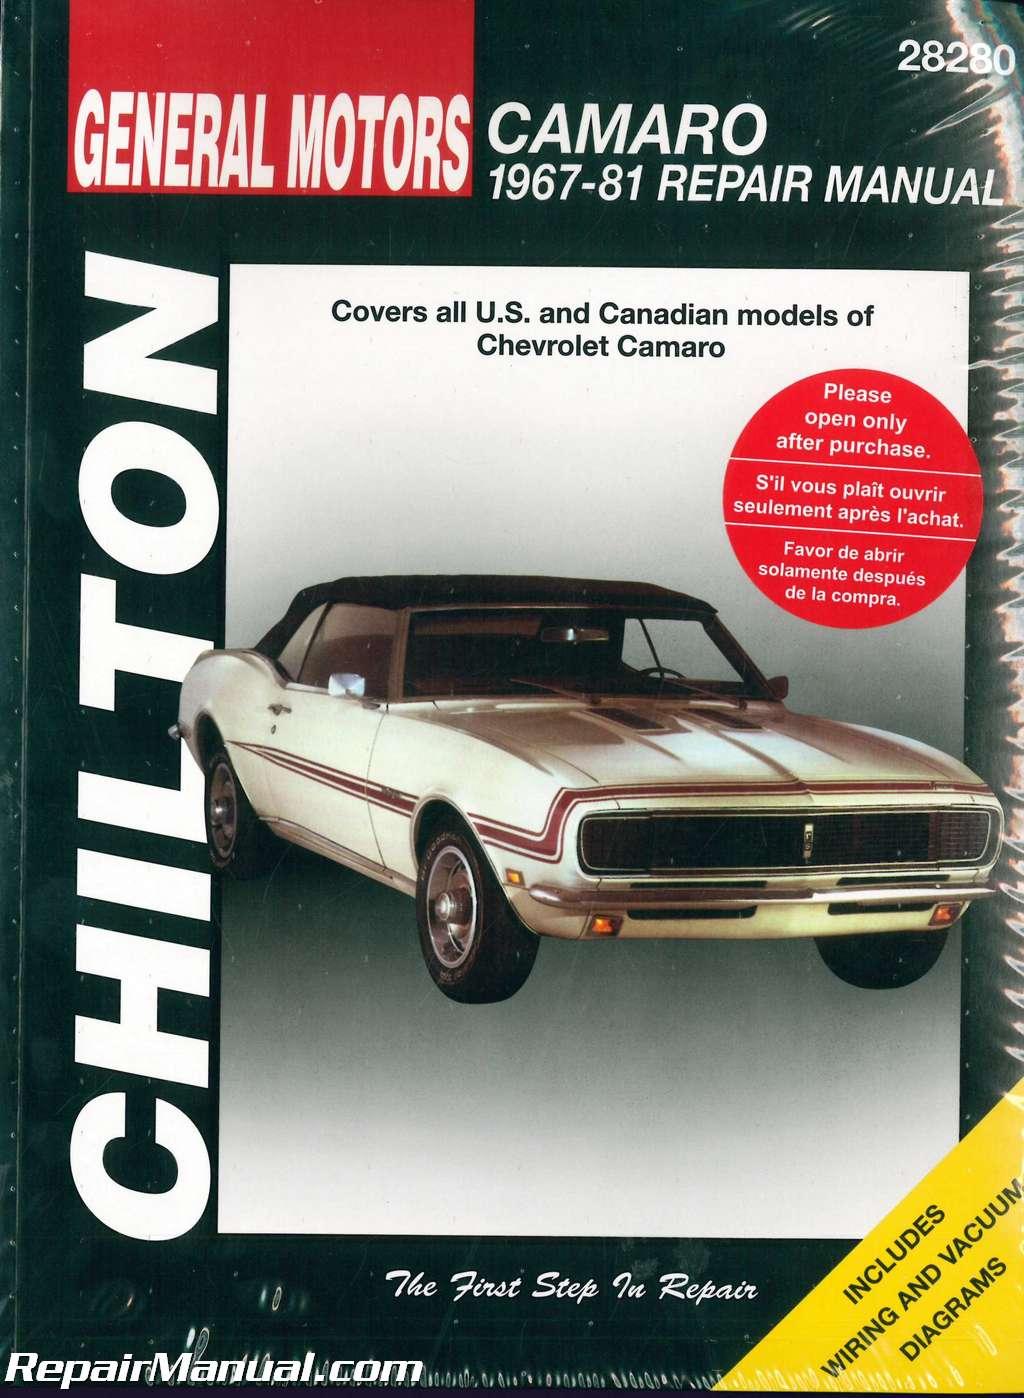 2016 Chevrolet Camaro Manual Guide